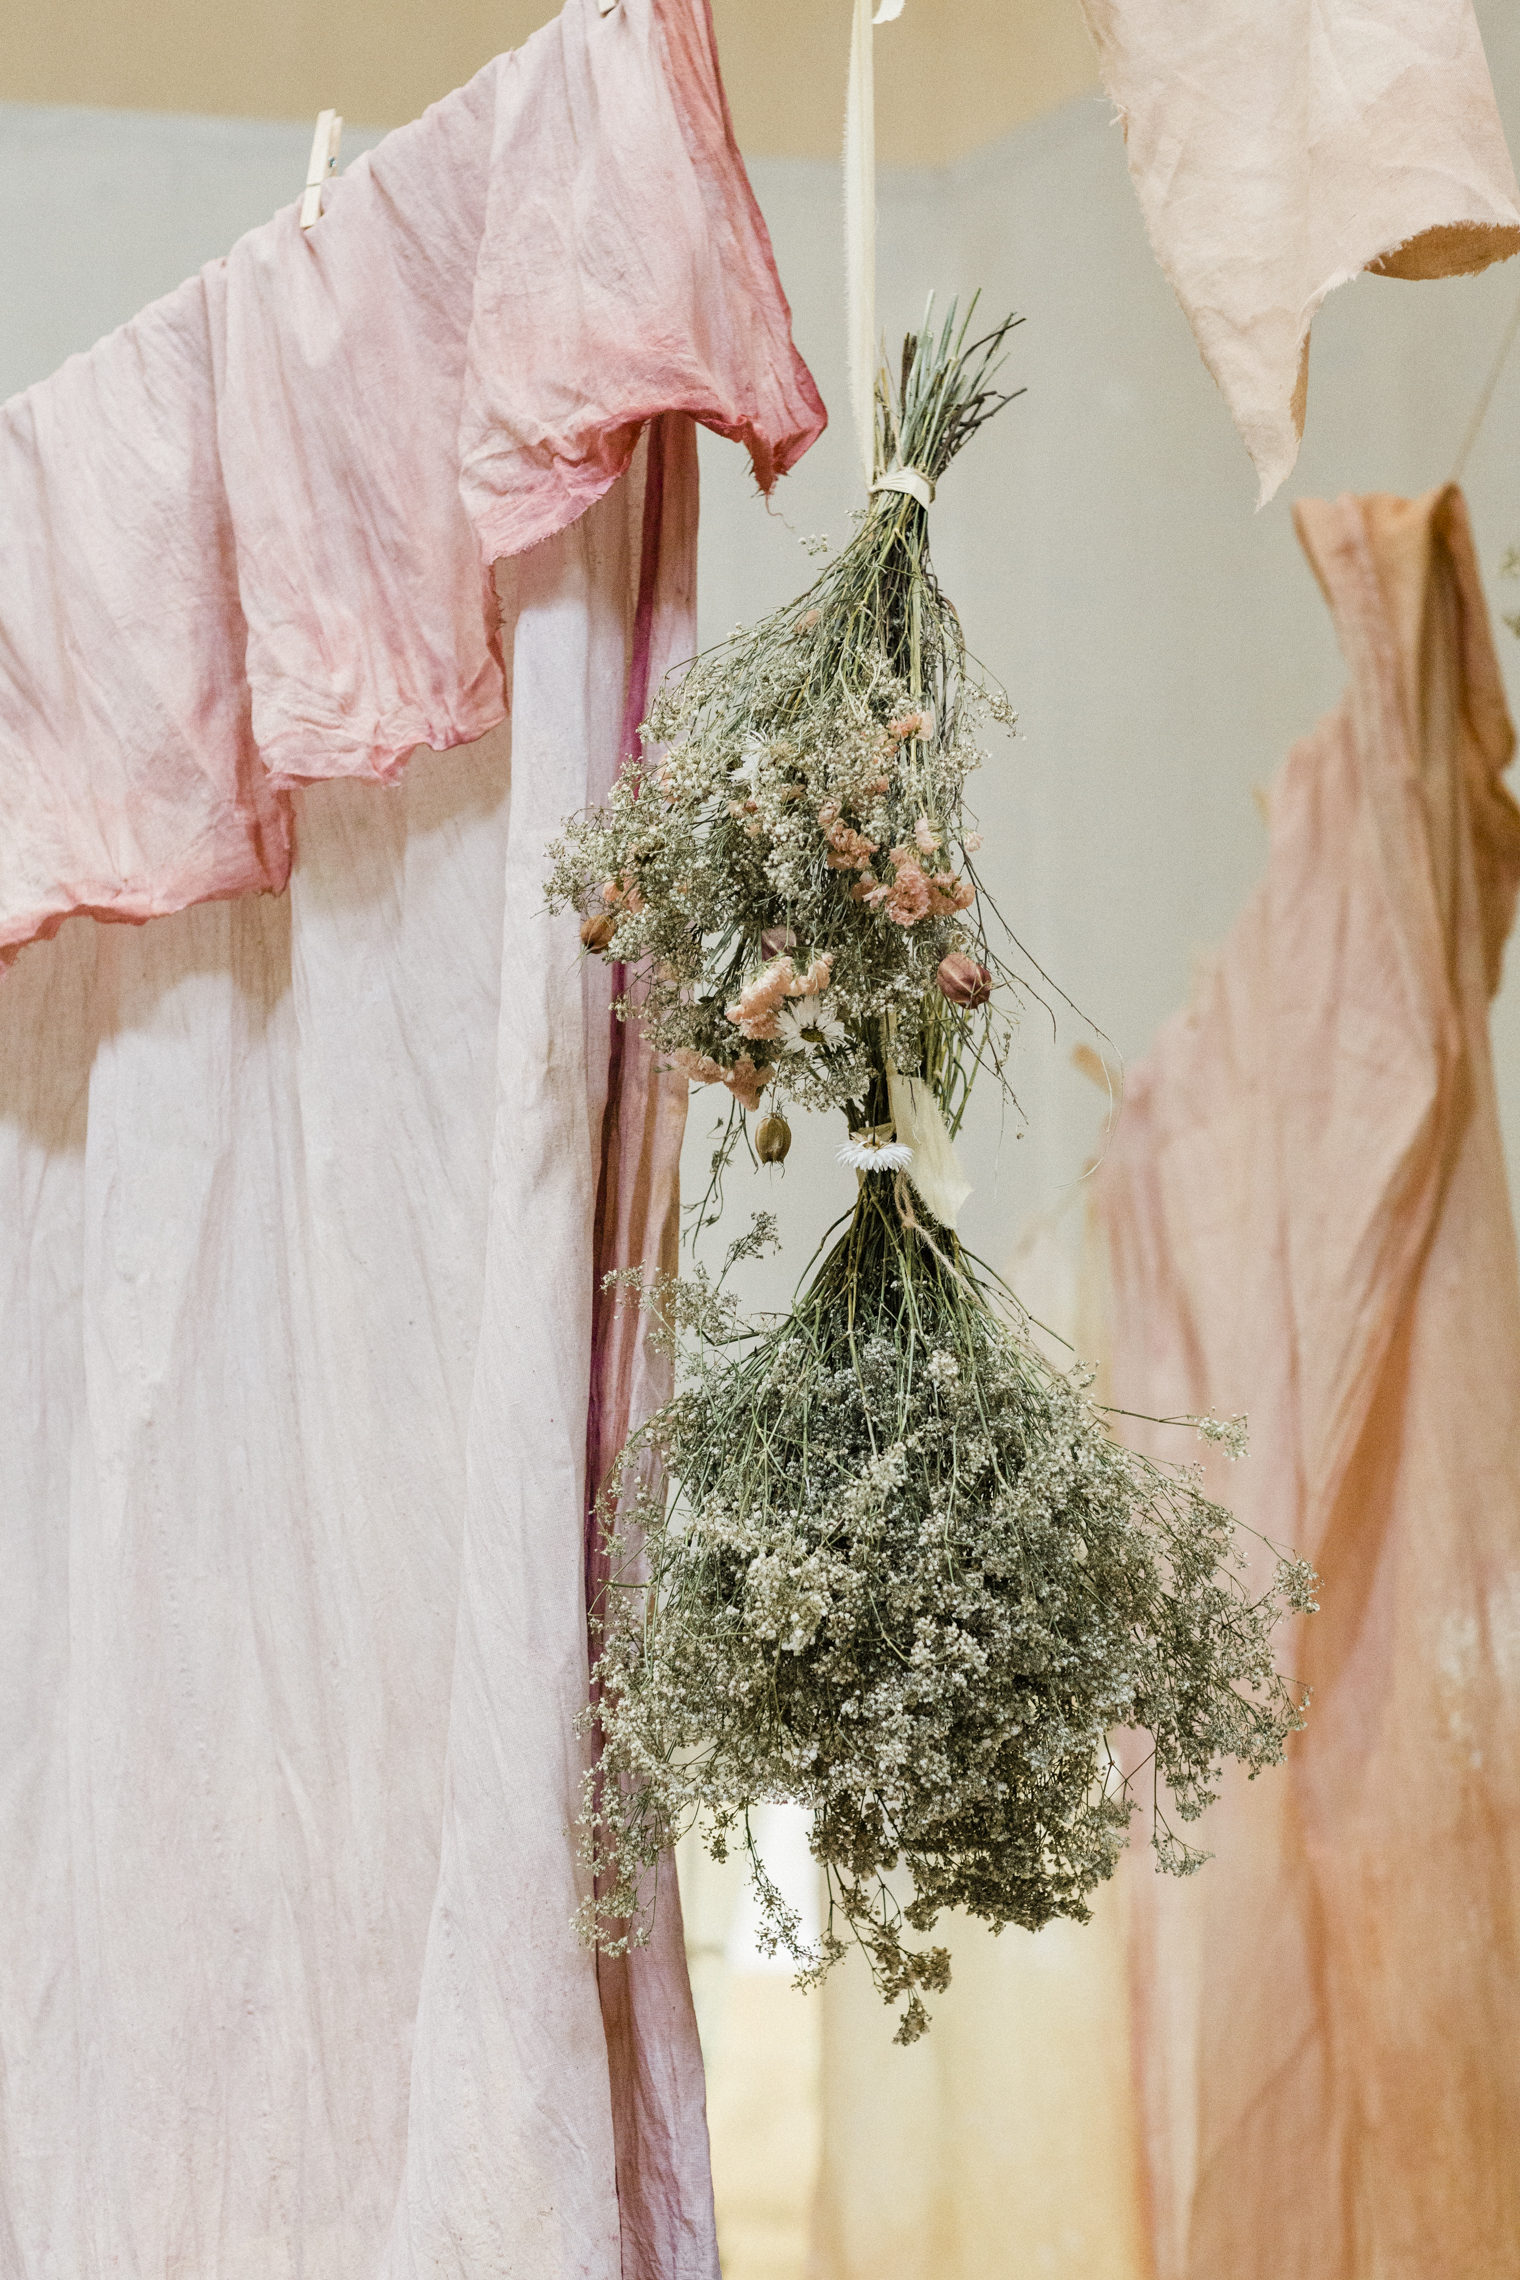 Worm Installation at the Garden Museum for British Flowers Week 2019